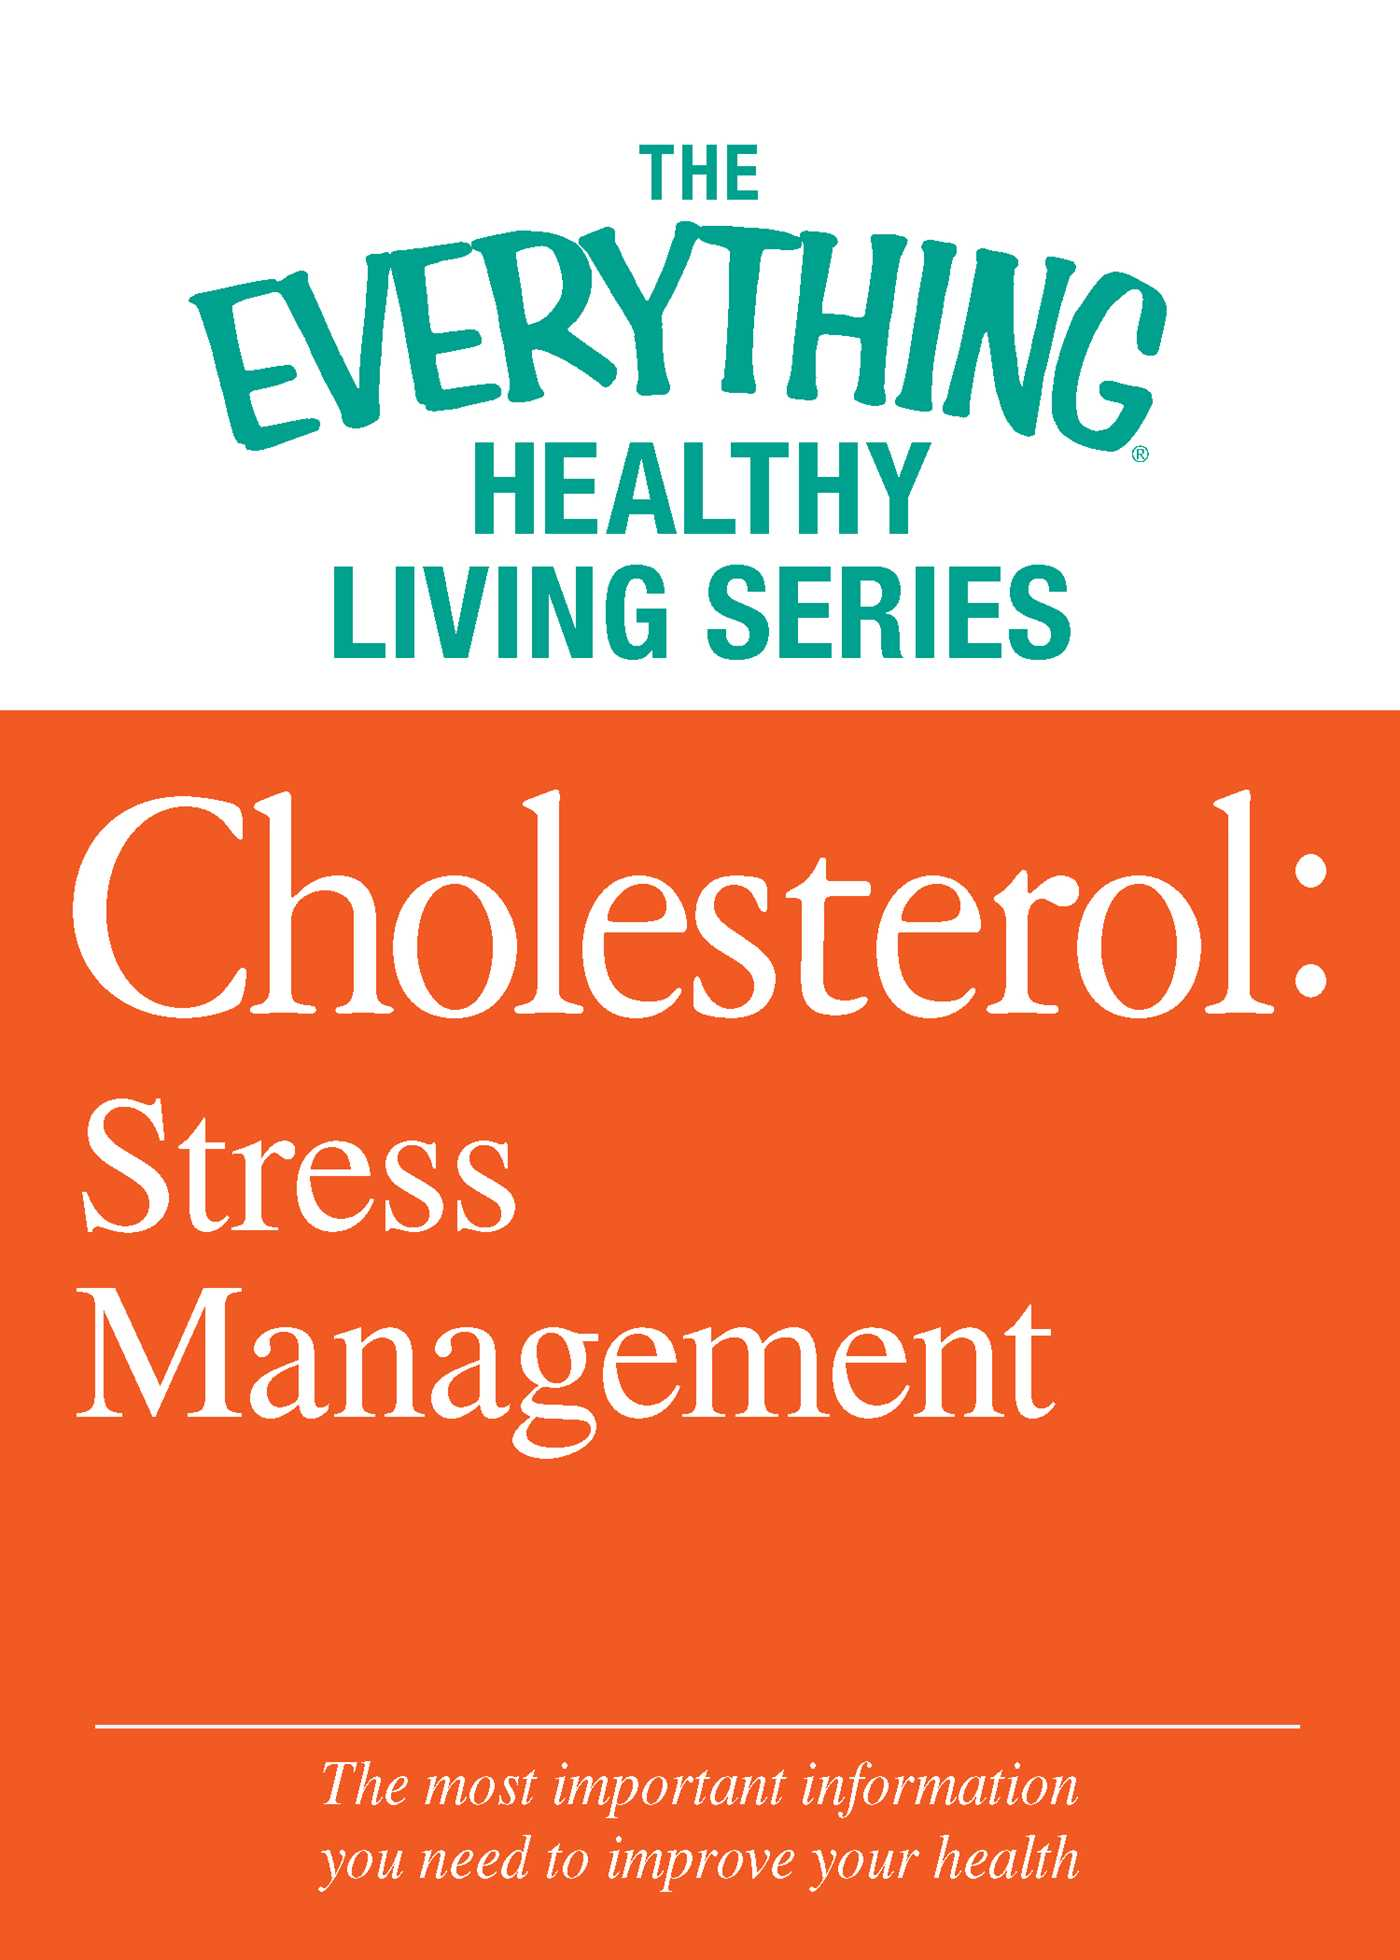 Cholesterol stress management 9781440547997 hr